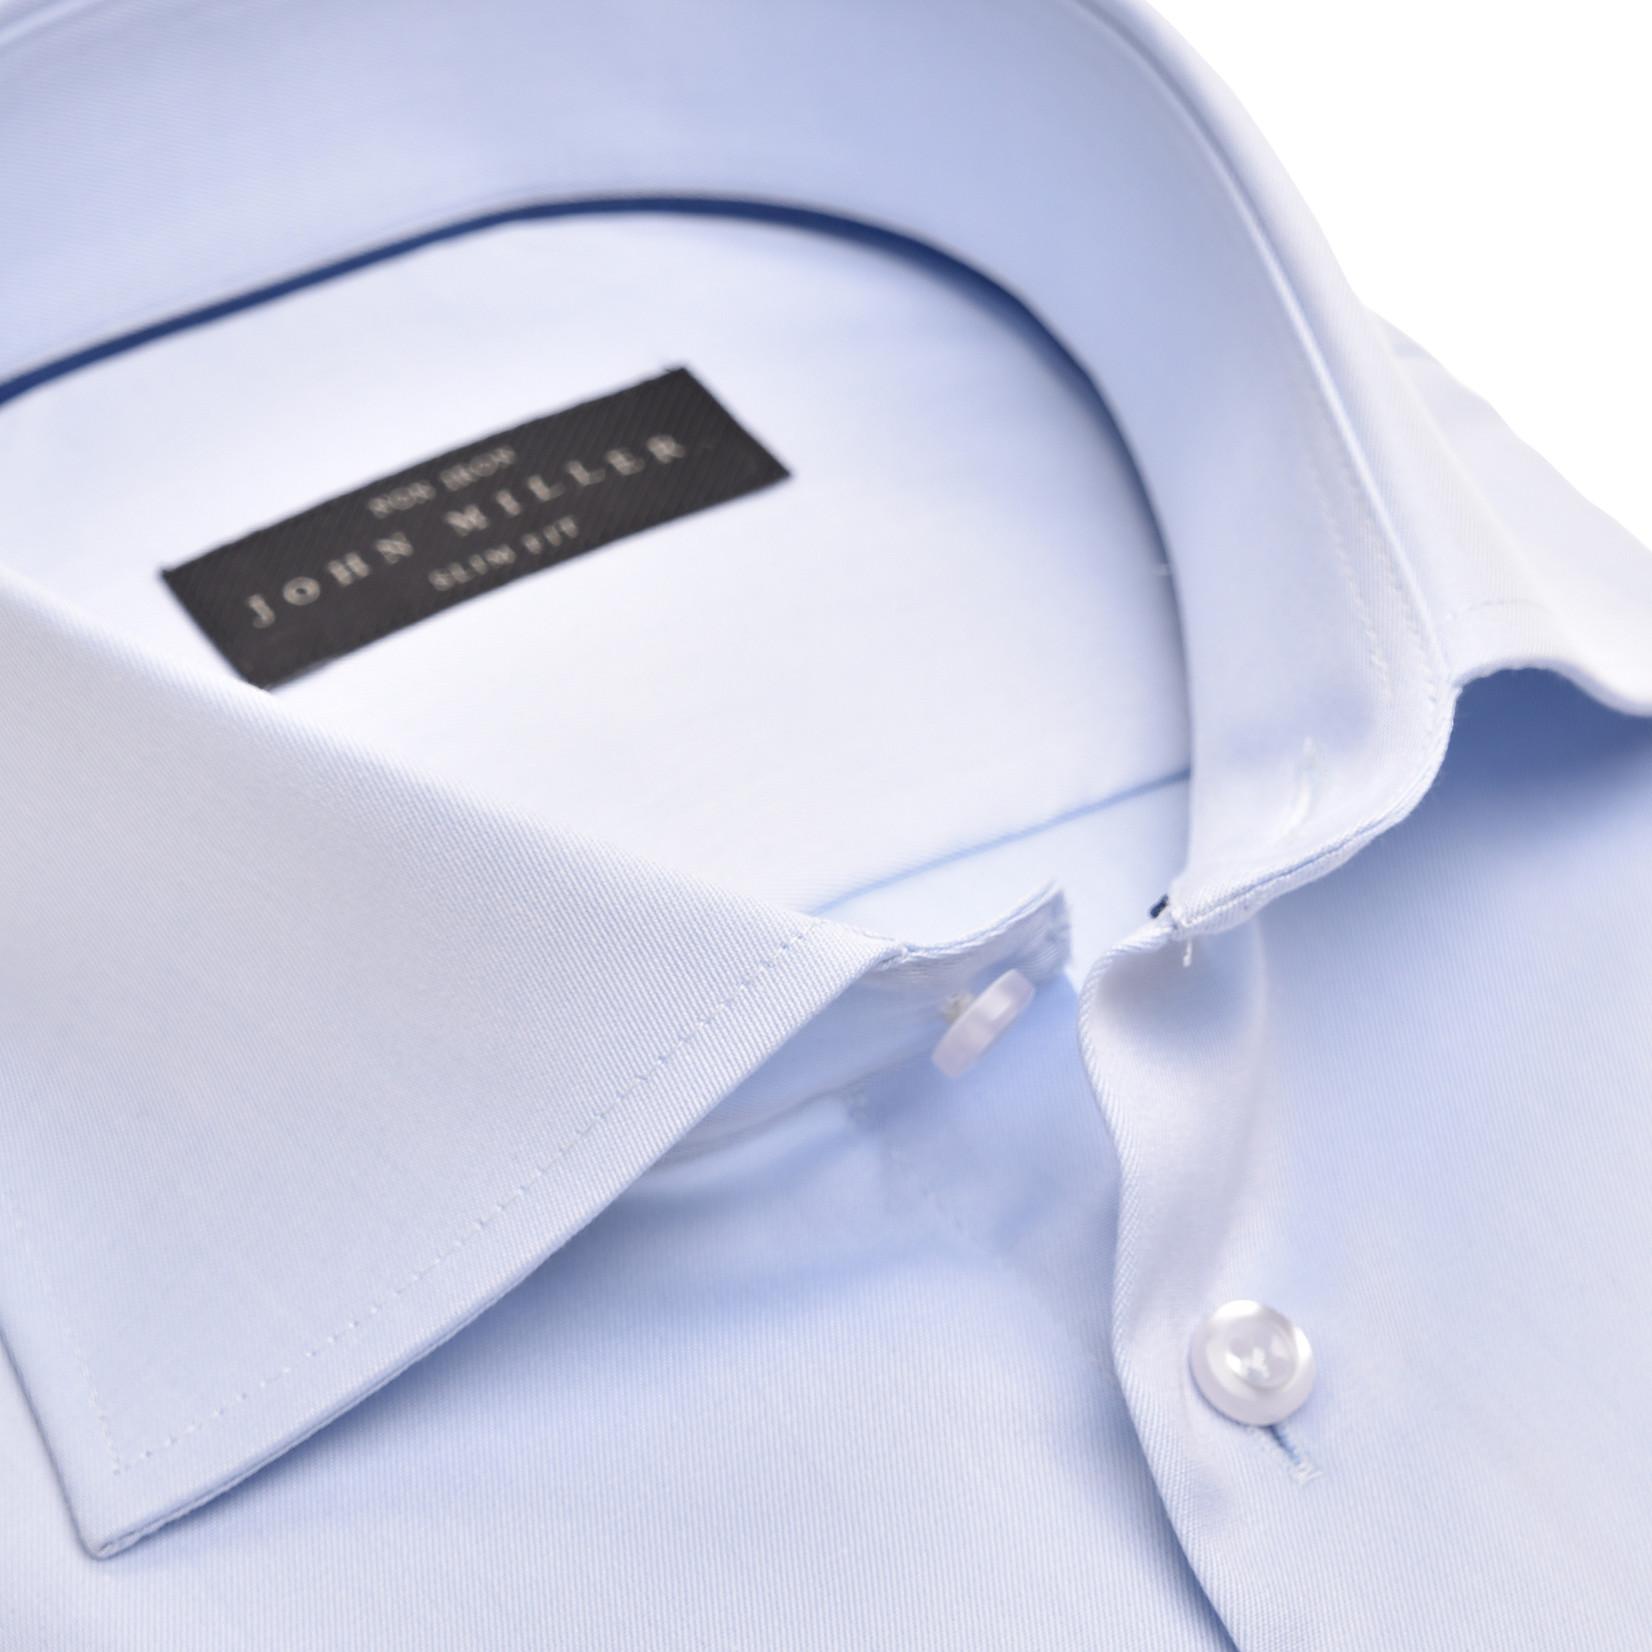 John Miller slim fit overhemd lichtblauw met wide spread boord